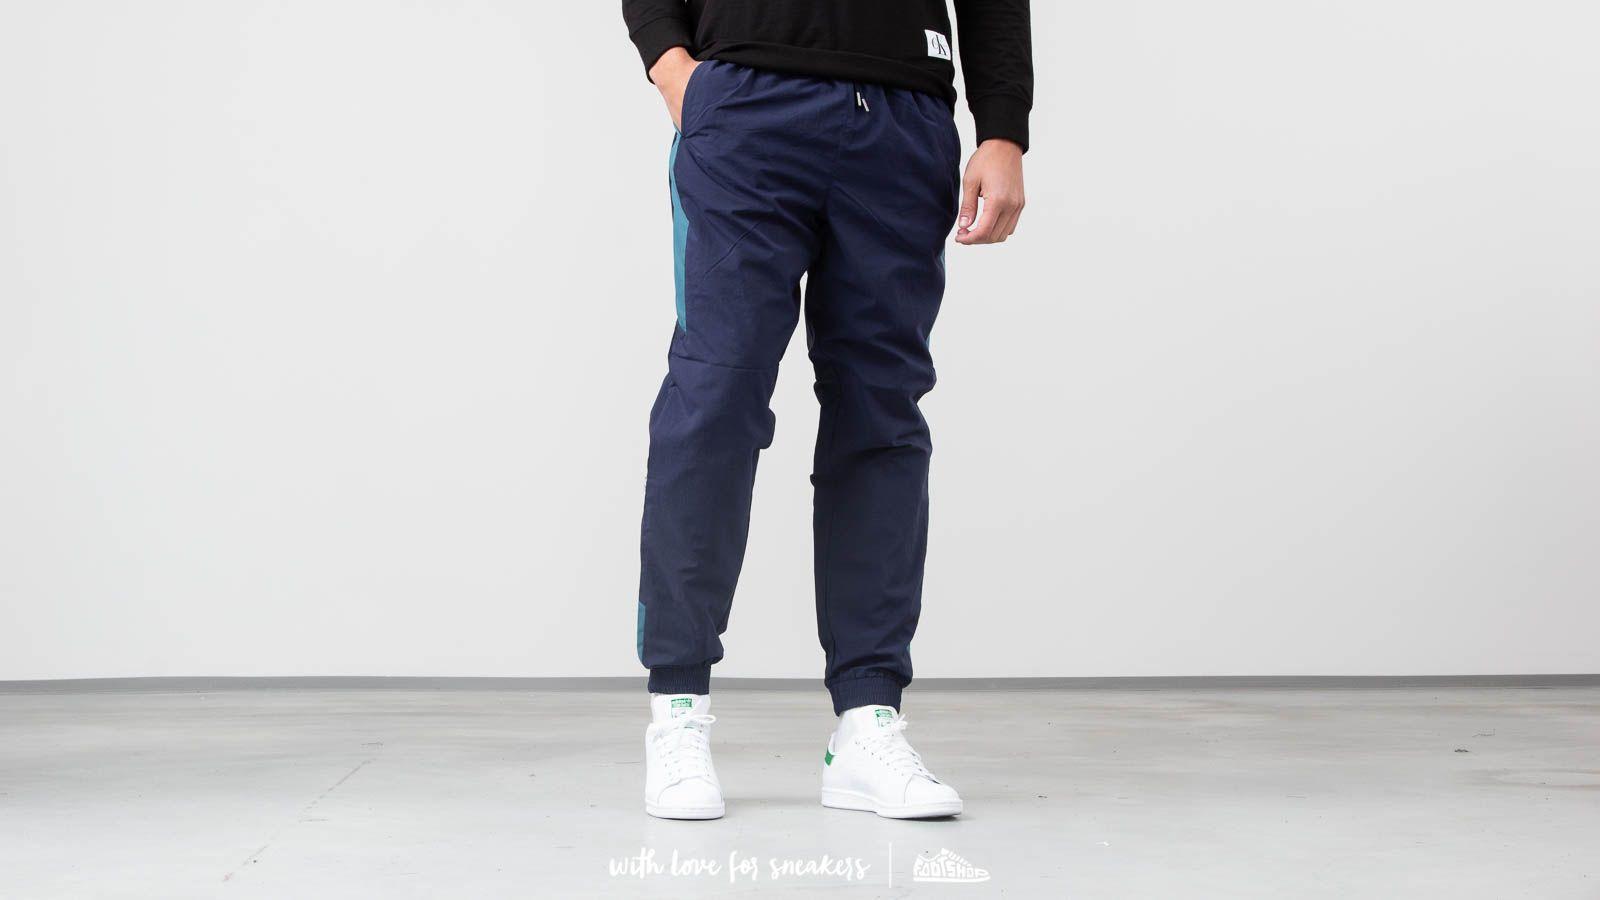 Puma XO Track Pants Peacoat za skvelú cenu 62 € kúpite na Footshop.sk